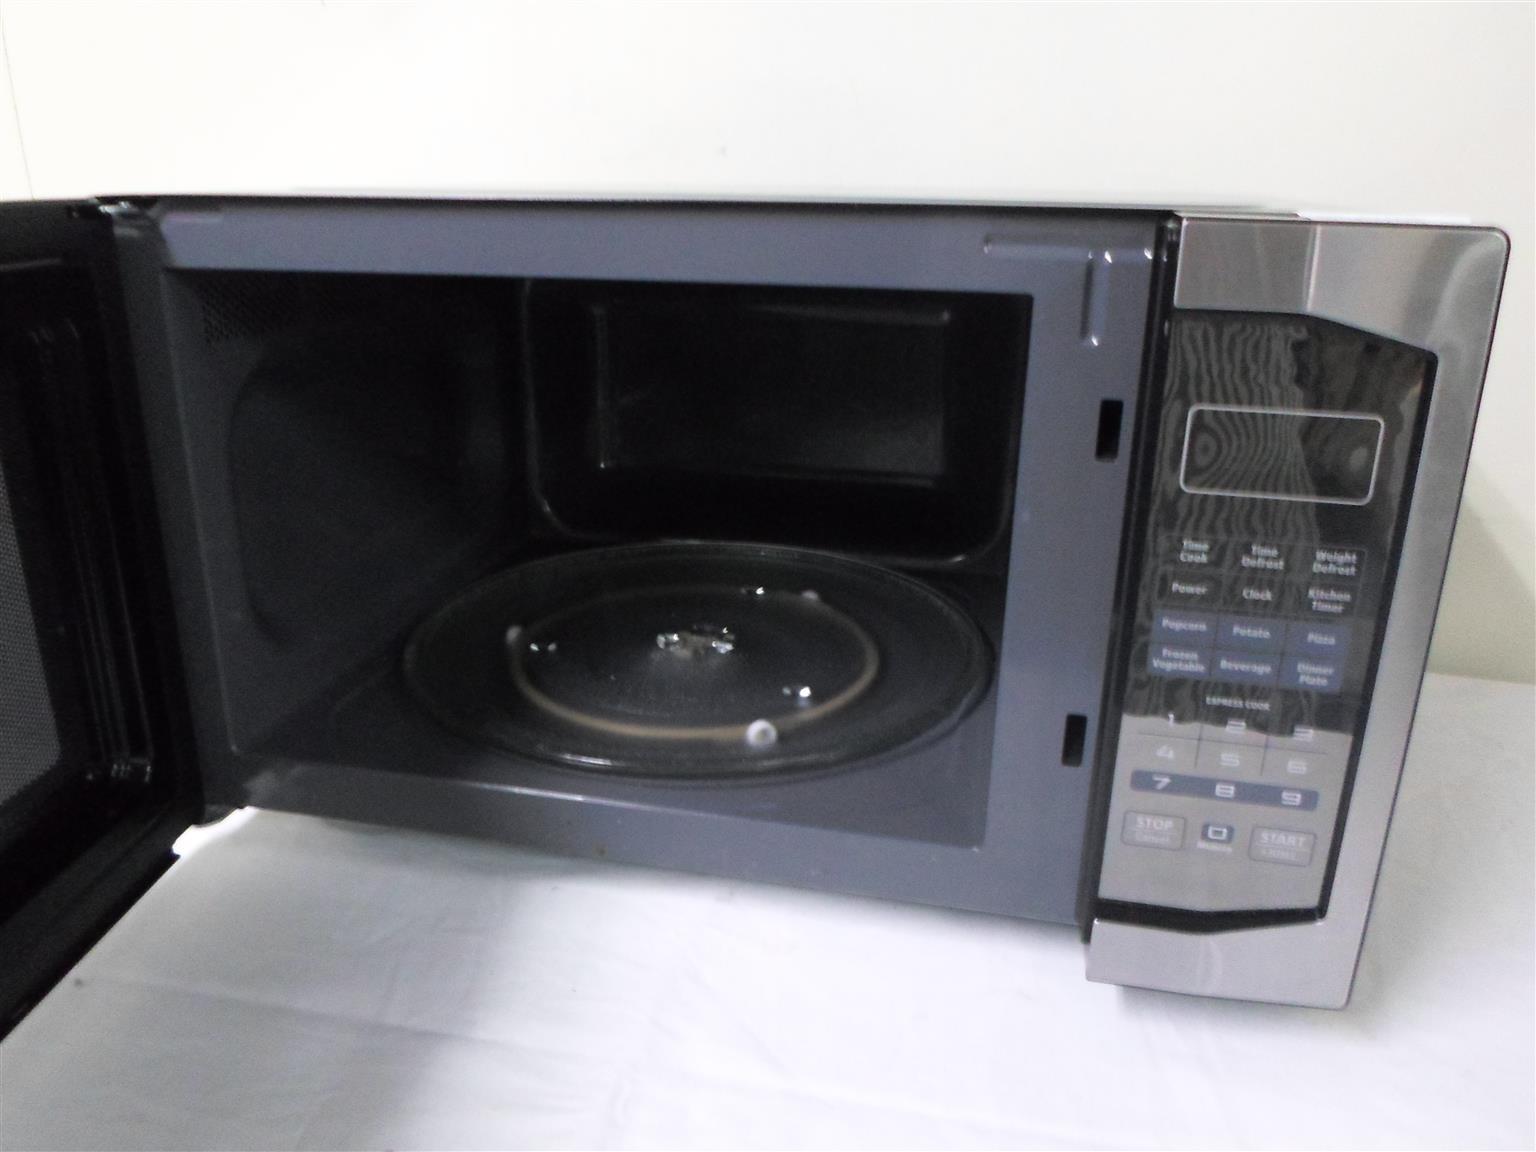 RHEM45BM Russel Hobbs Microwave